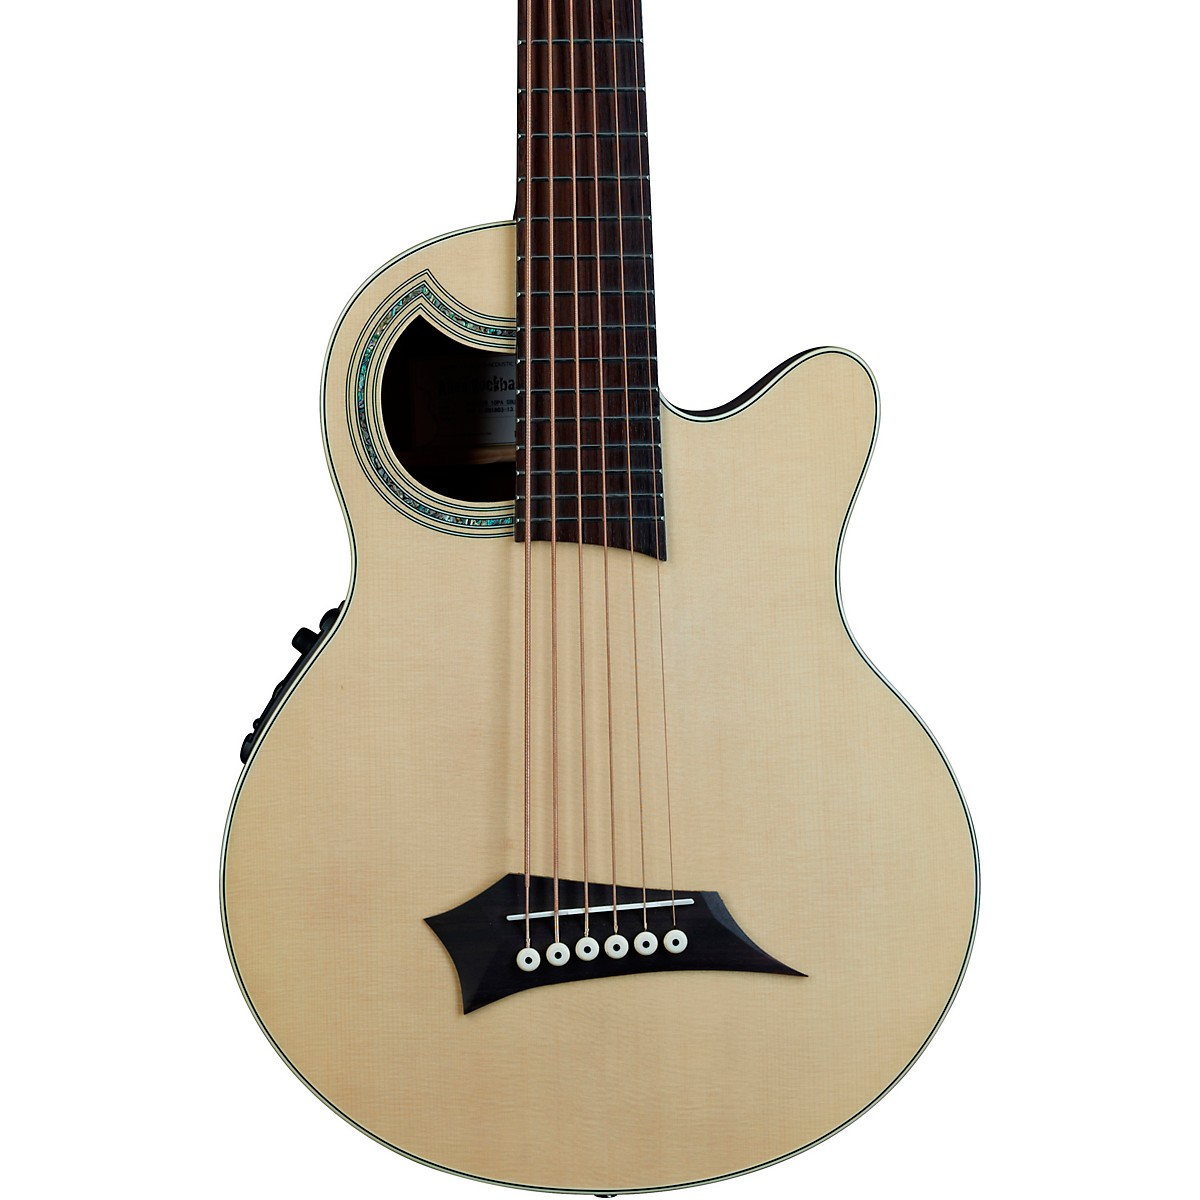 Warwick Alien Deluxe 6-String Acoustic-Electric Bass